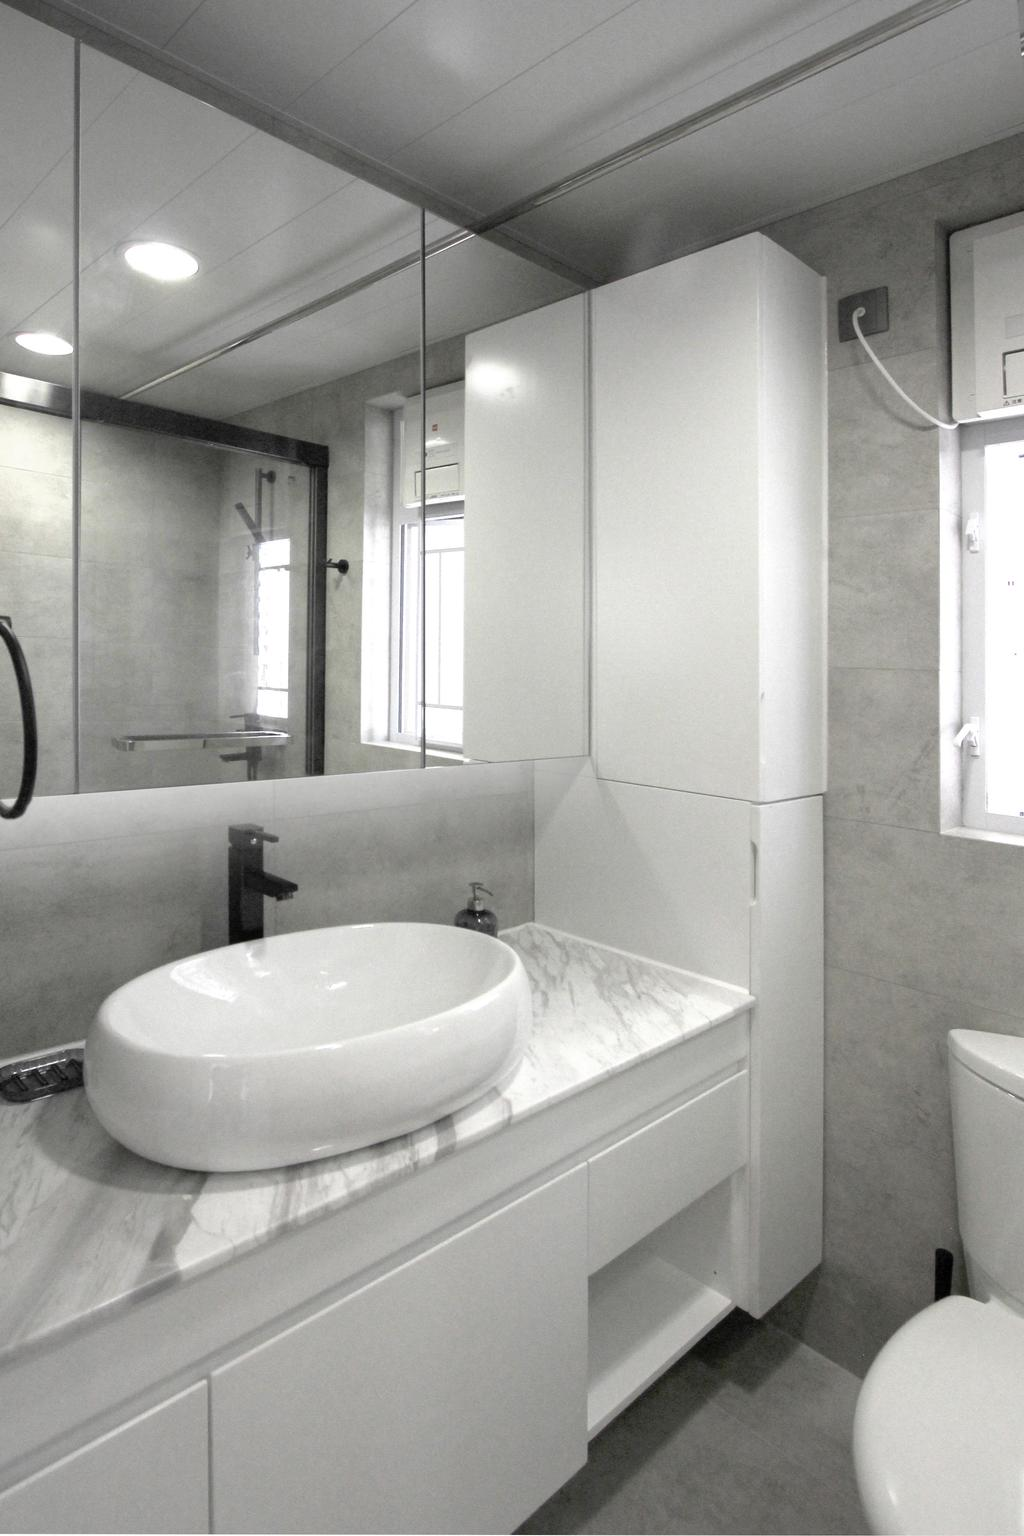 北歐, 公屋/居屋, 浴室, 寧峰苑, 室內設計師, MNOP Design, 簡約, Indoors, Interior Design, Room